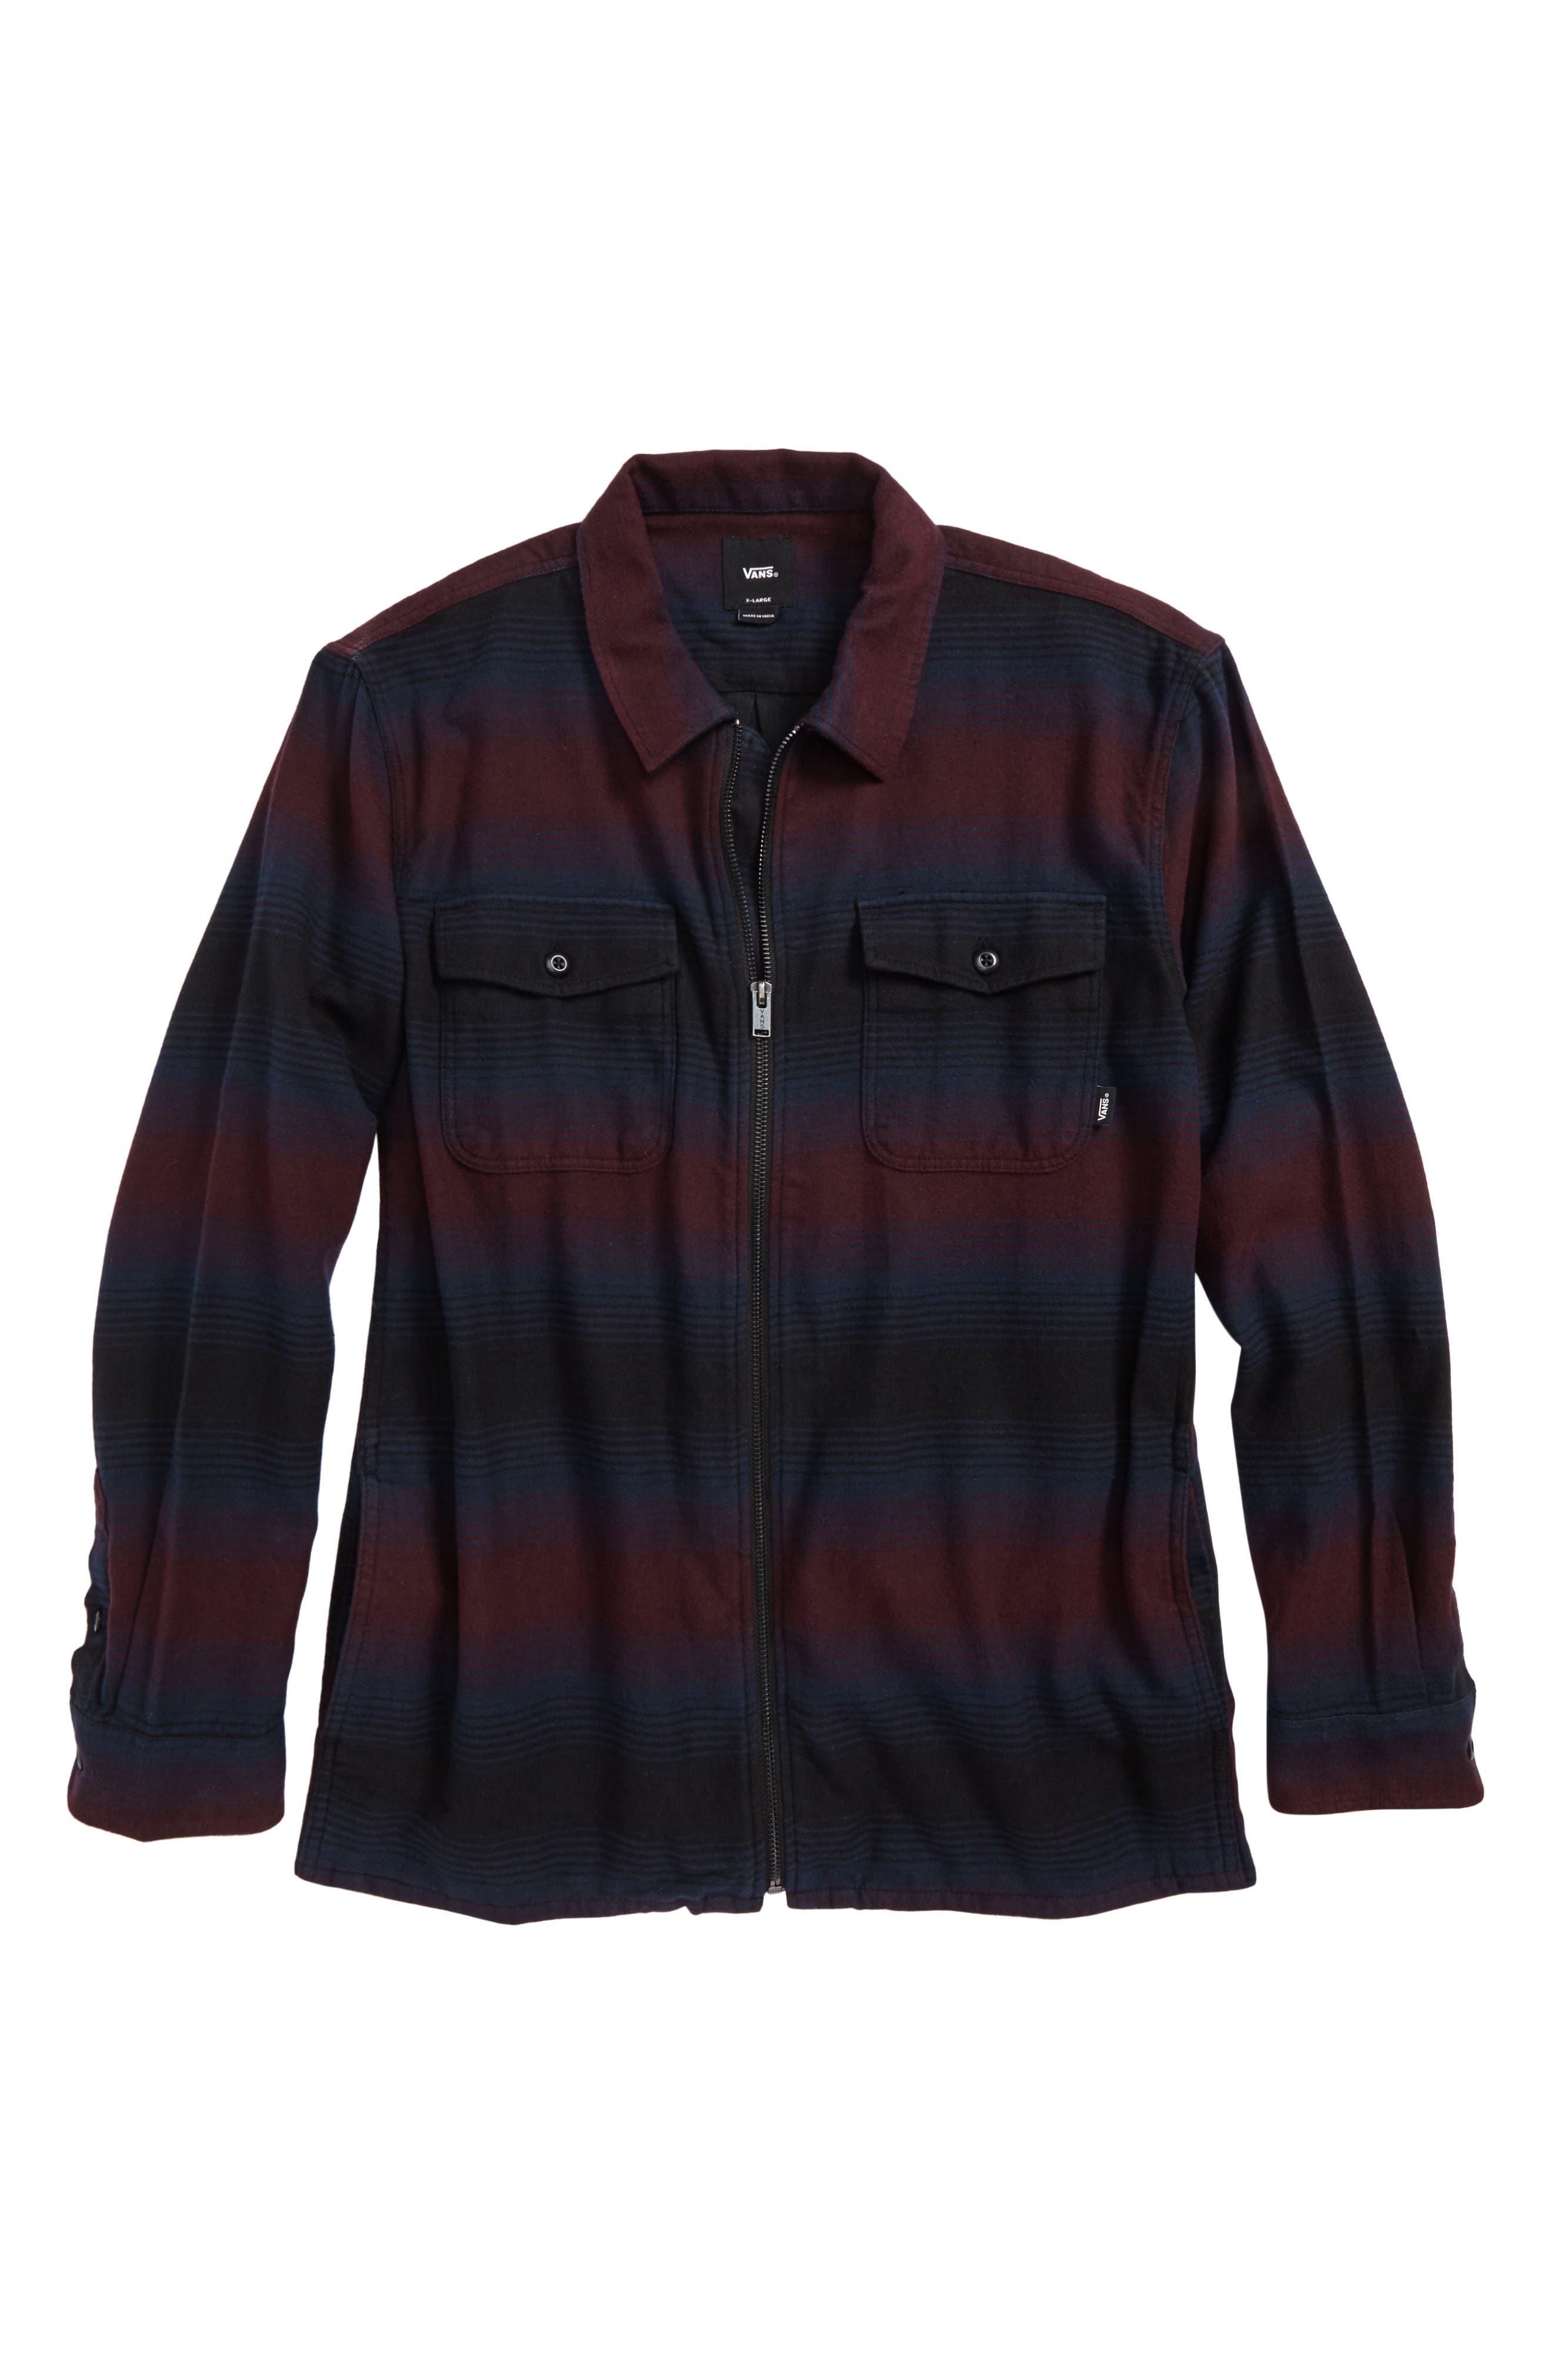 Brewster Zip Front Flannel Shirt,                             Main thumbnail 1, color,                             Port Royale/ Stripe